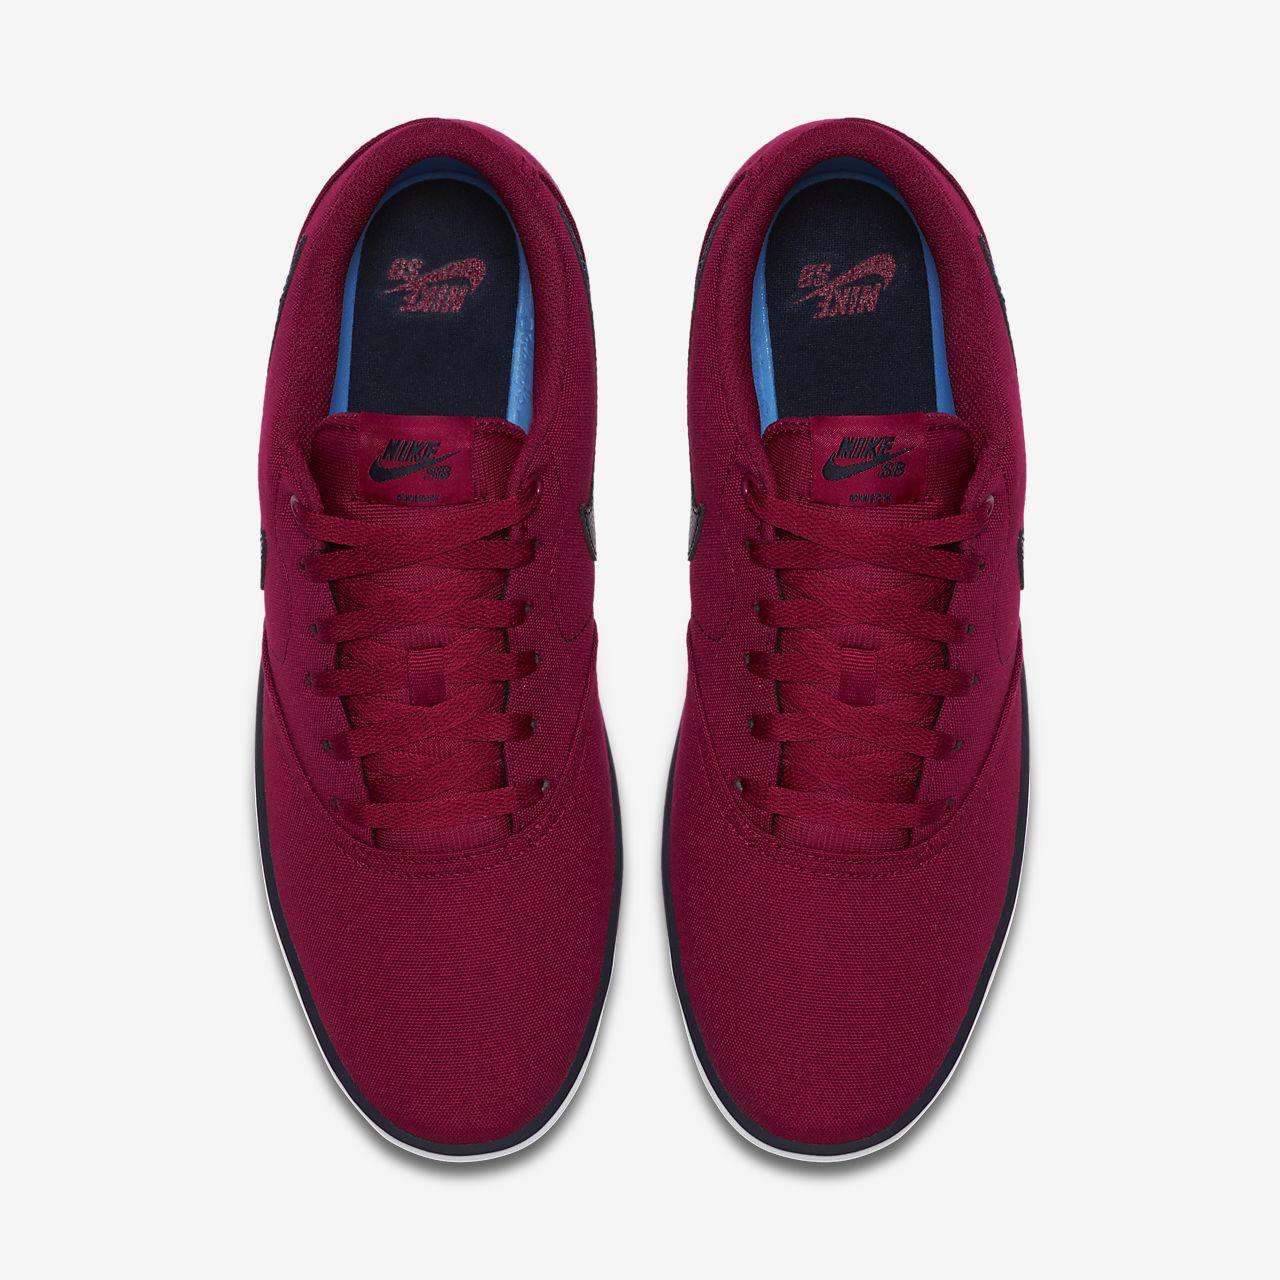 pretty nice 61740 3aa2e ... Nike SB Check Solarsoft Canvas Men s Skateboarding Shoe